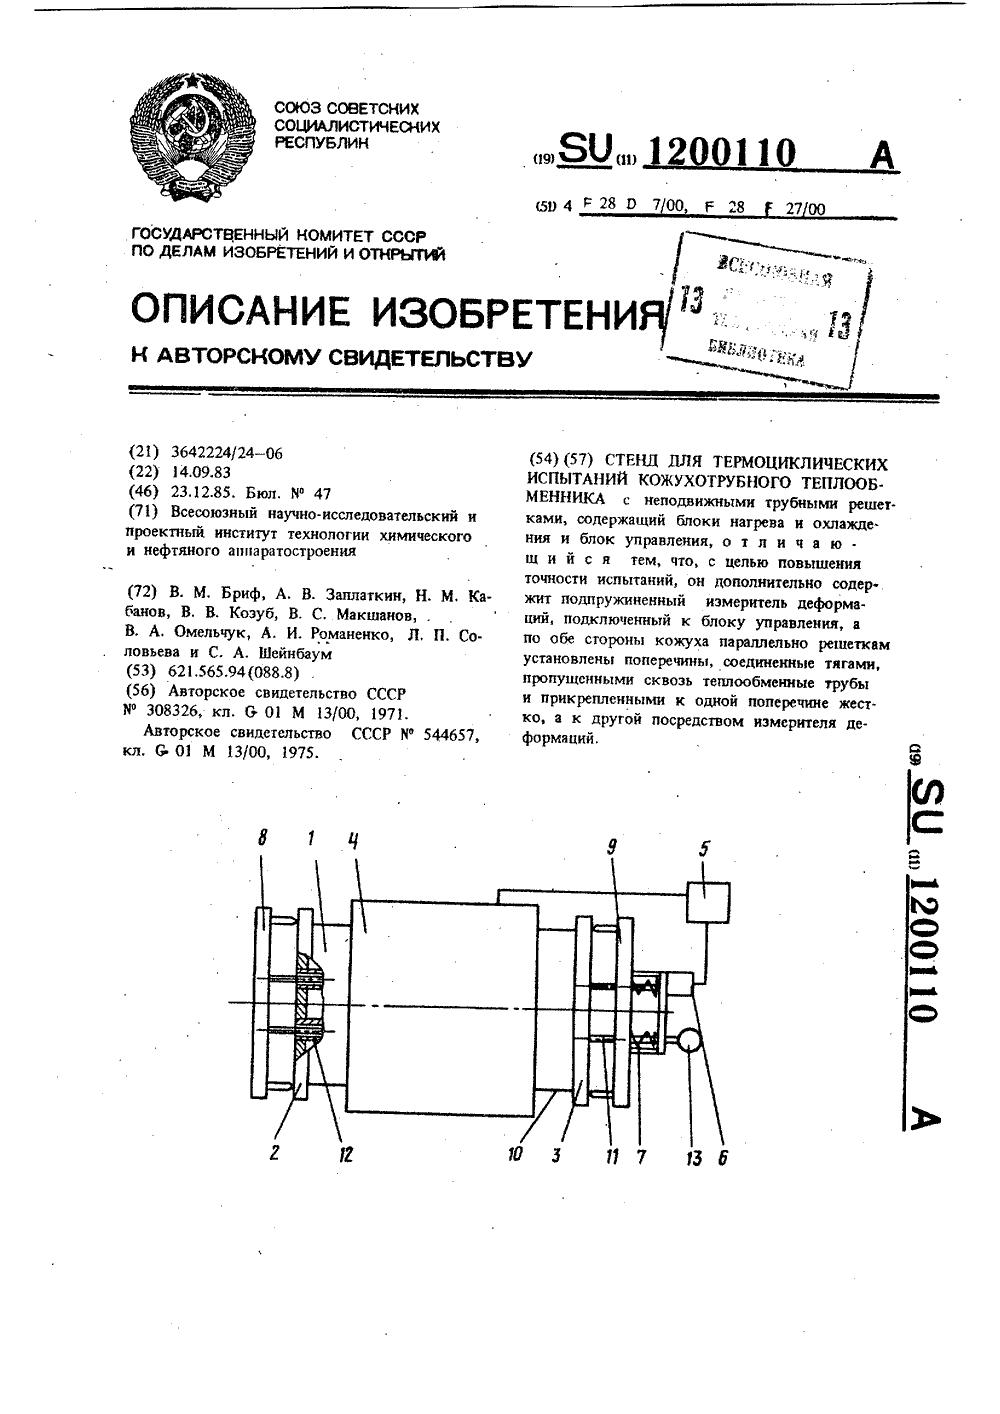 Стенд теплообменником Пластинчатый теплообменник ТПлР S11 ST.02. Артём